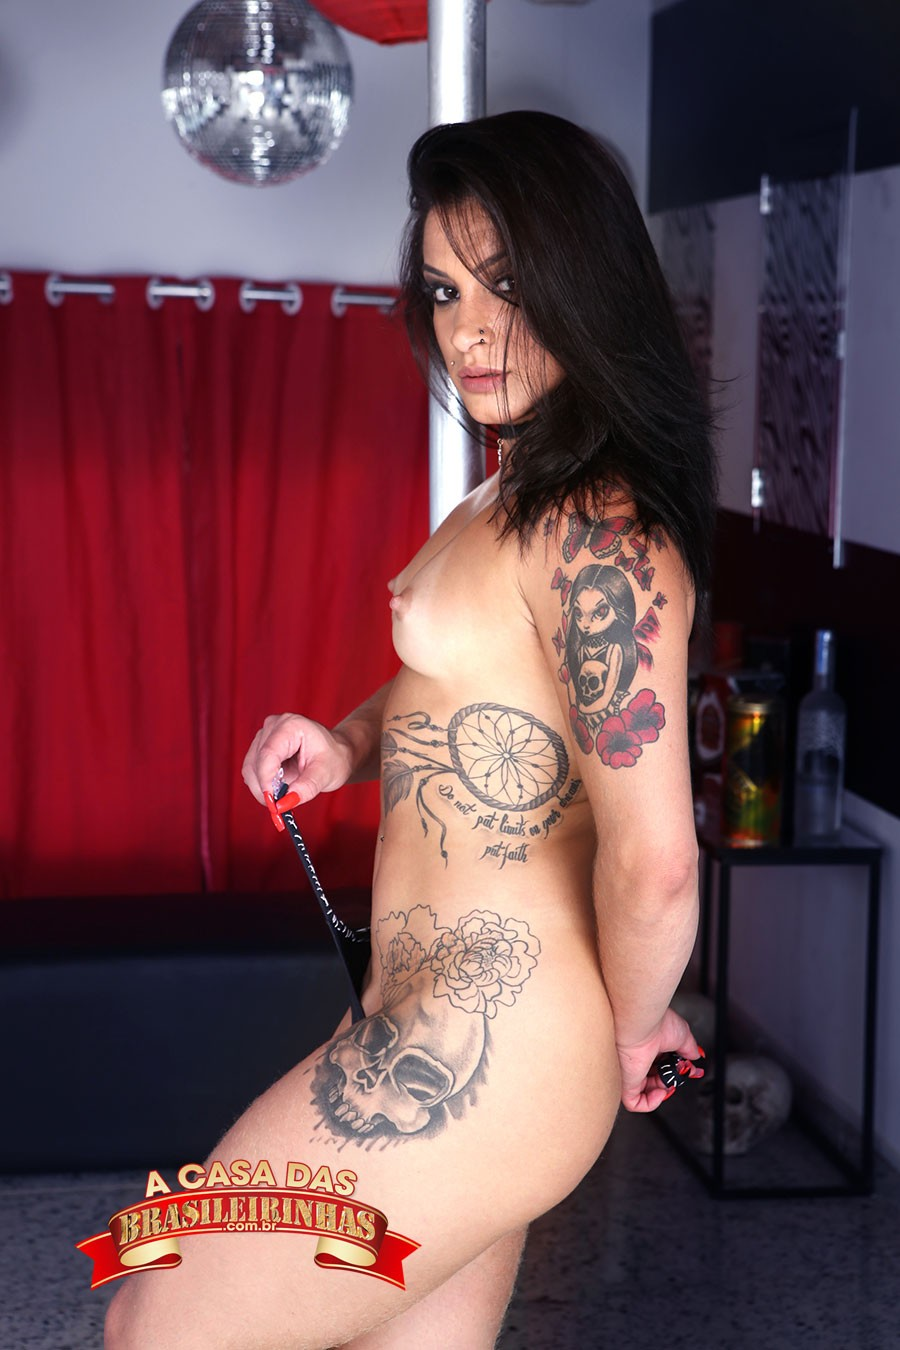 atriz-porno-tatuada.jpg